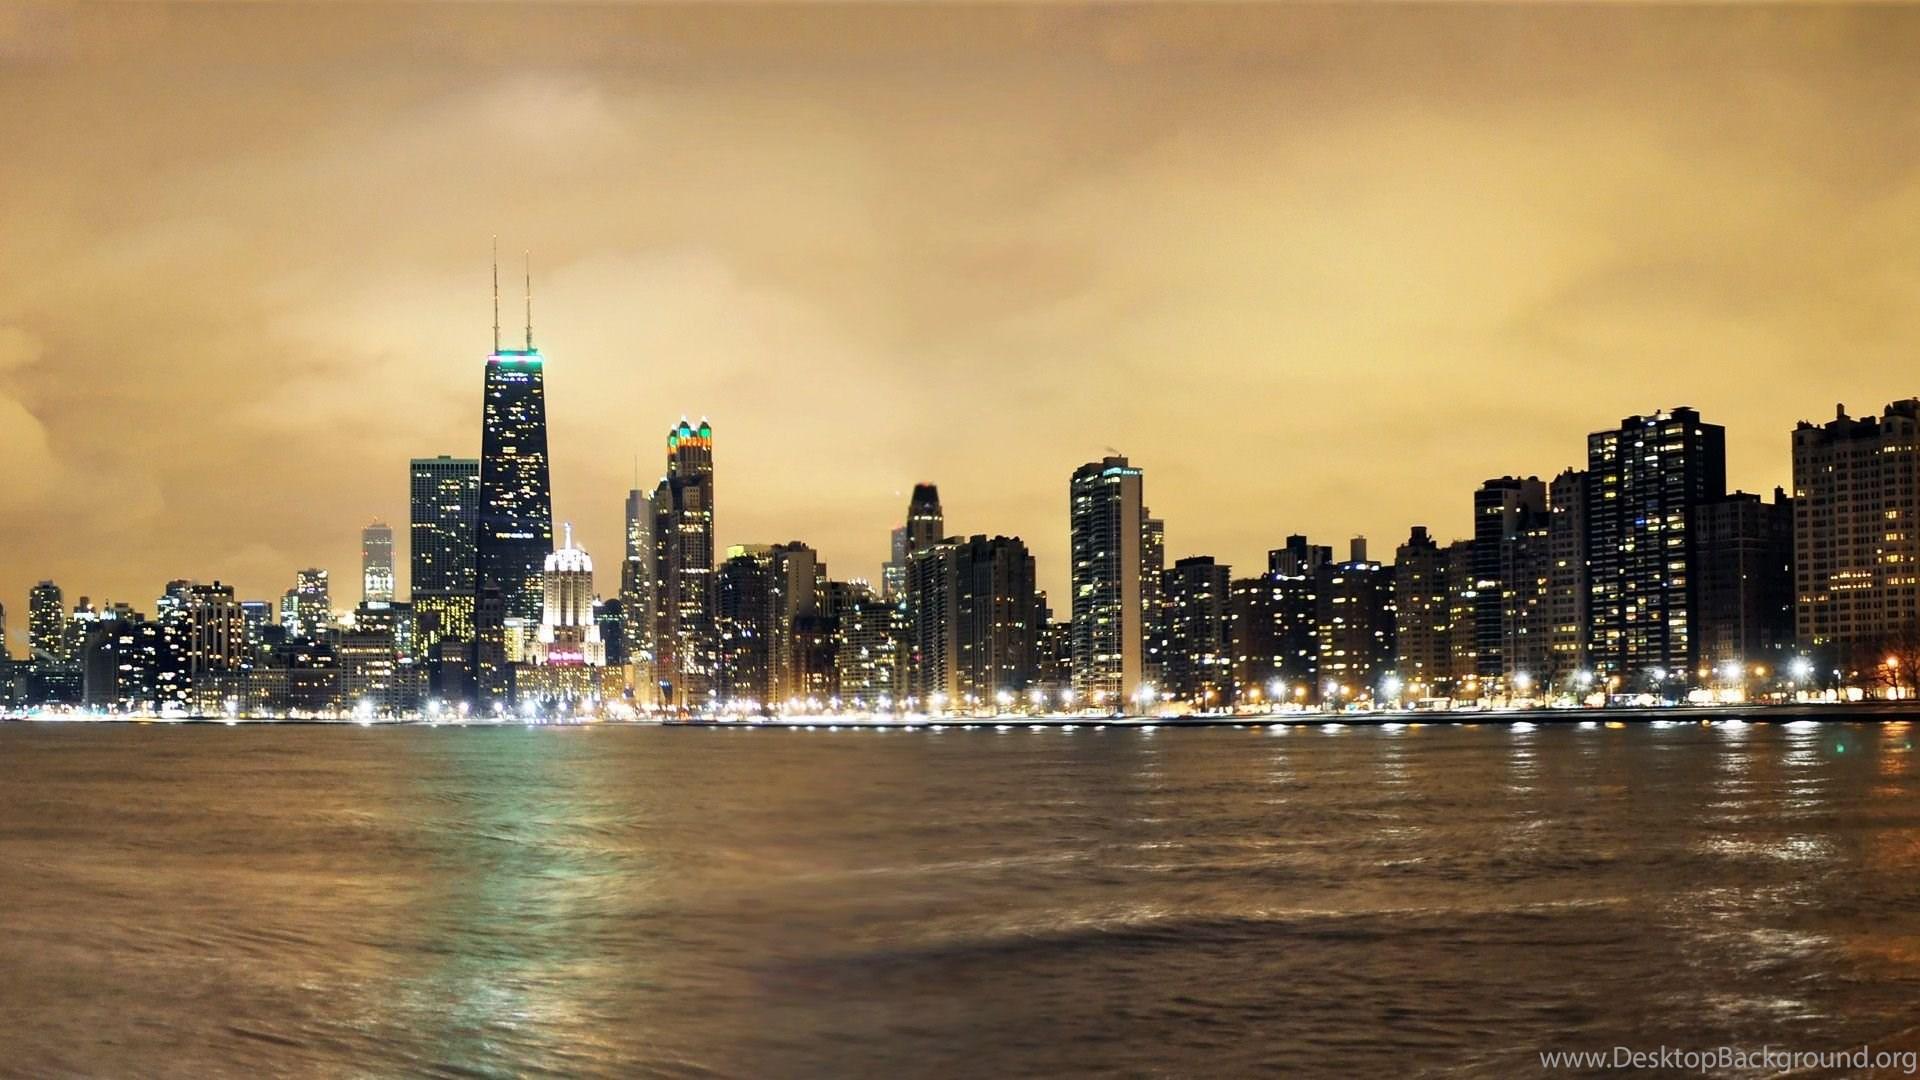 Chicago Skyline At Night Wallpaper Desktop Background